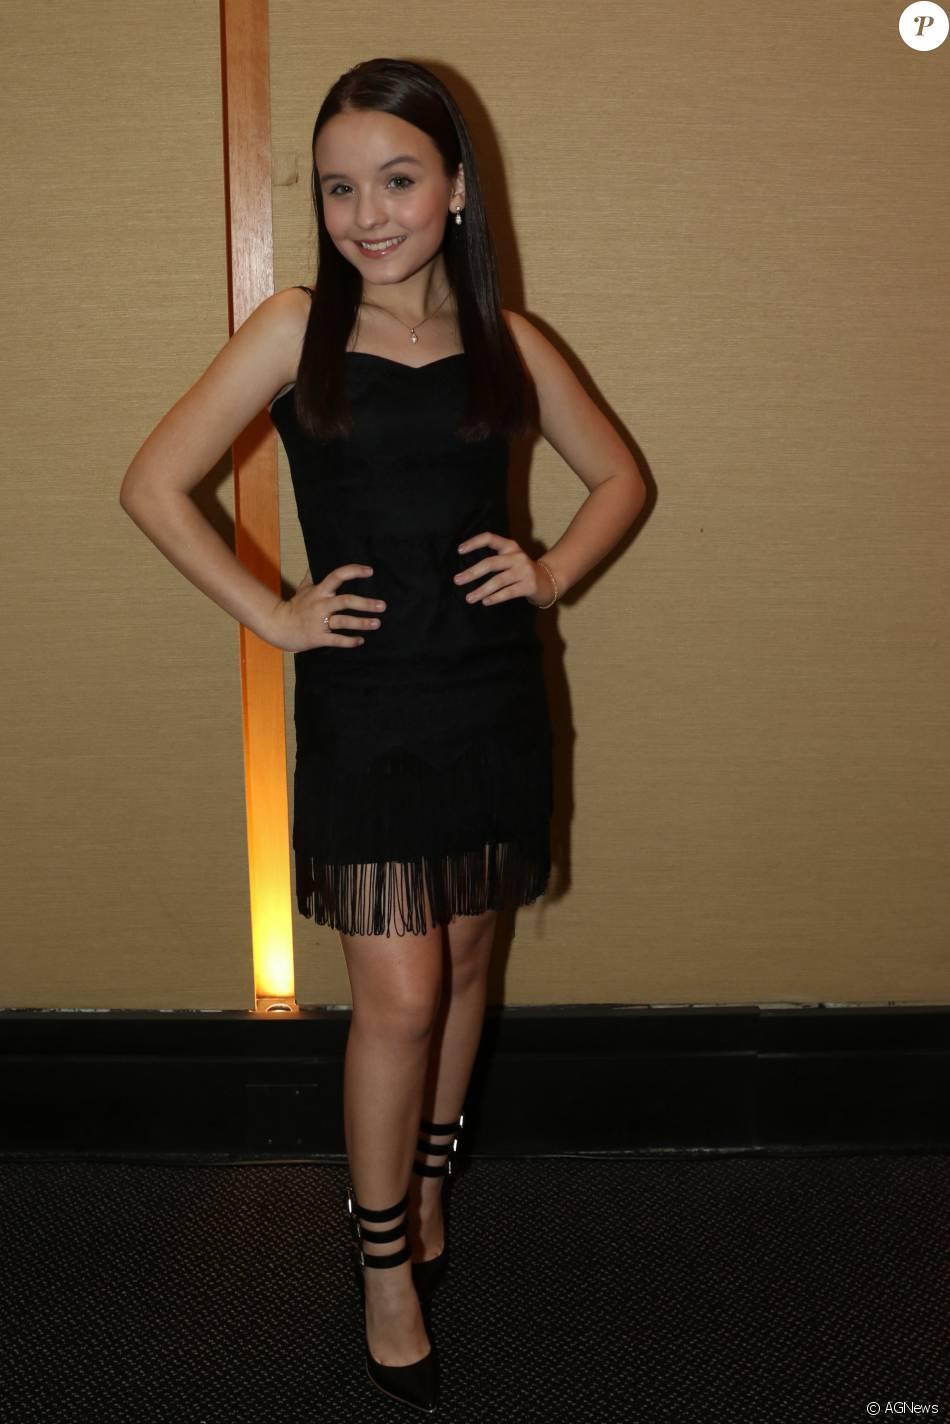 Larissa Manoela apesar da pouca idade já mostra estilo - Purepeople d2c0a83ba4